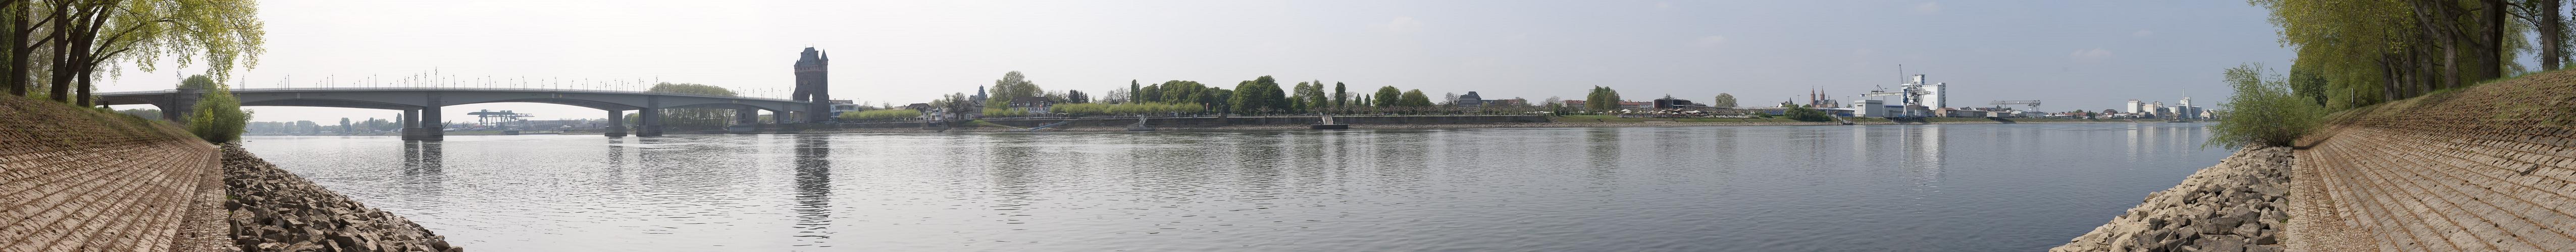 Panorama - Worms am Rhein